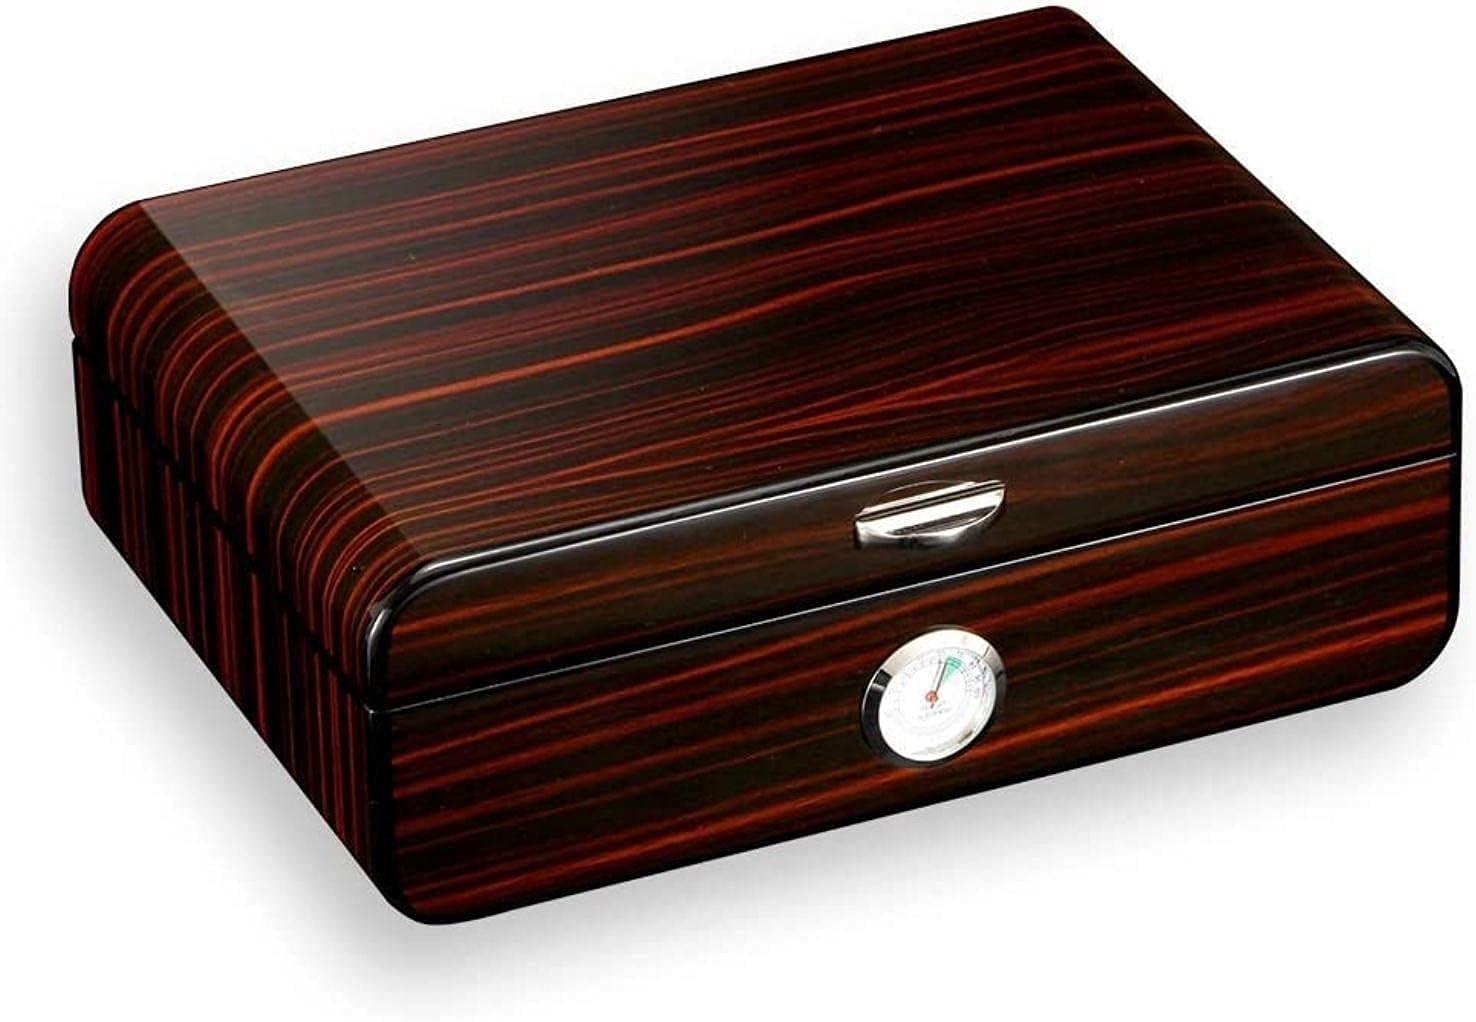 ZHJBD Smoking Set Cigar Accessories trust Box Cedar Philadelphia Mall Humidor Wood